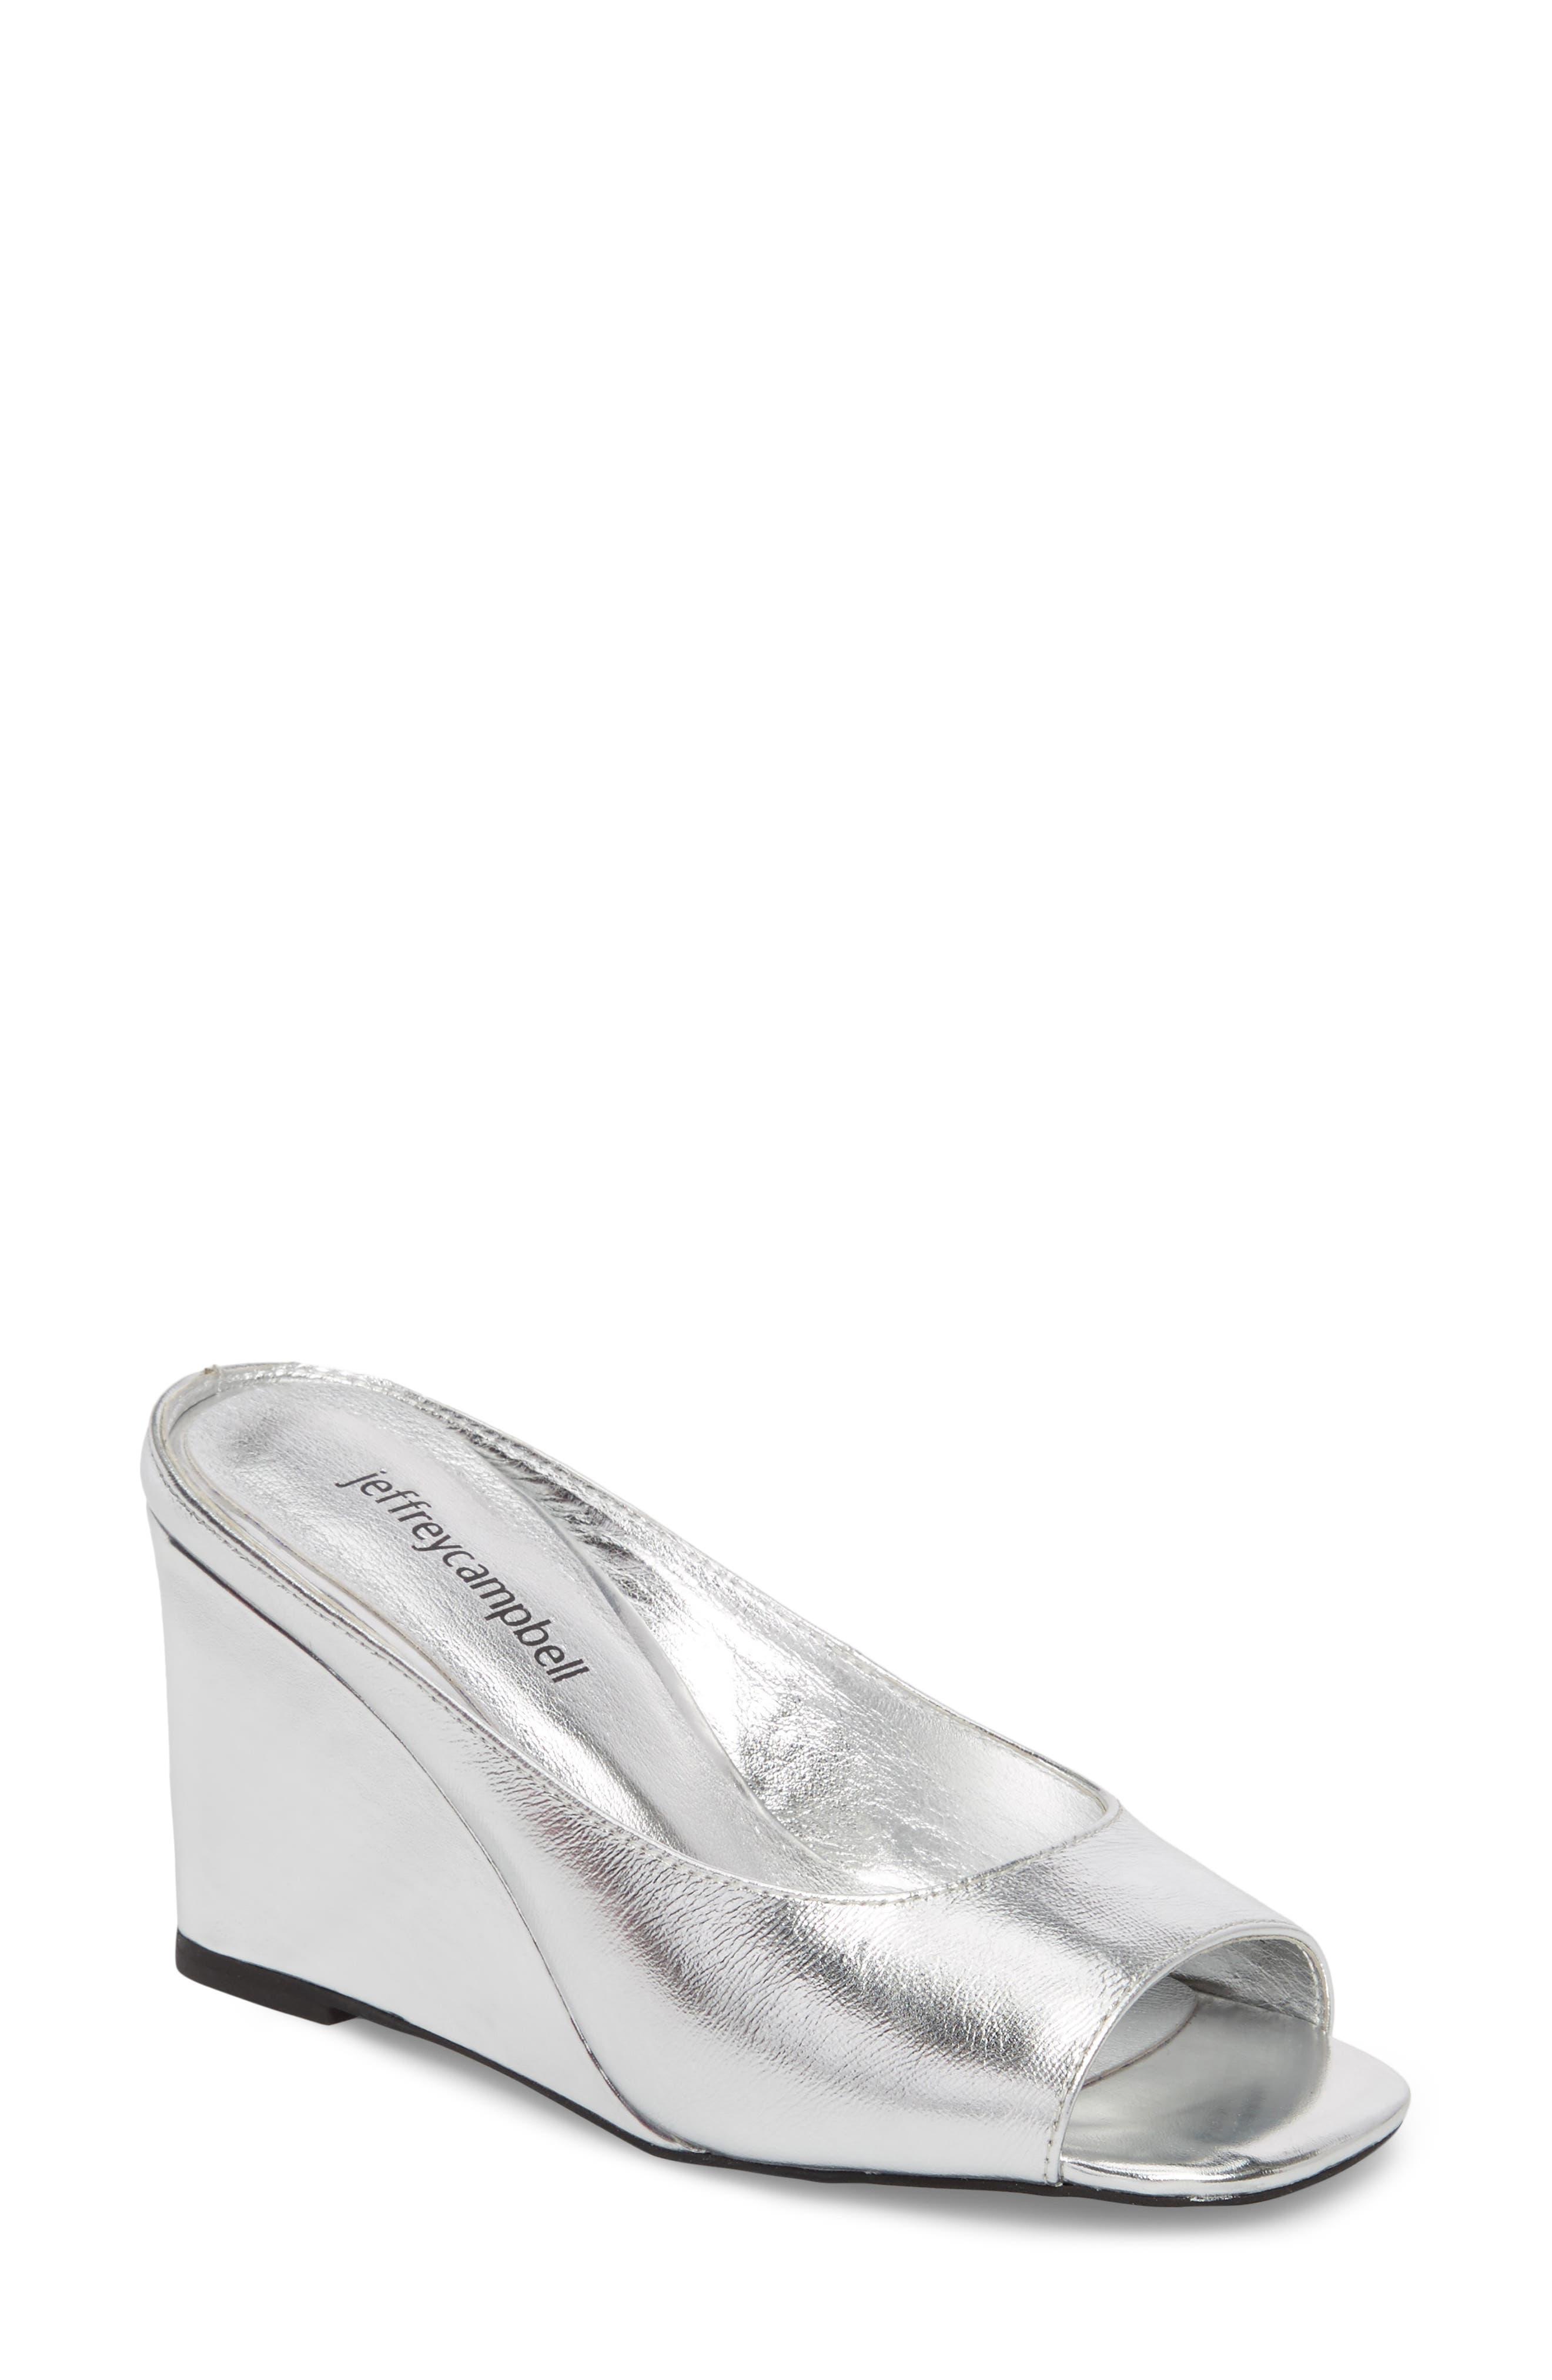 Main Image - Jeffrey Campbell Generous Wedge Sandal (Women)